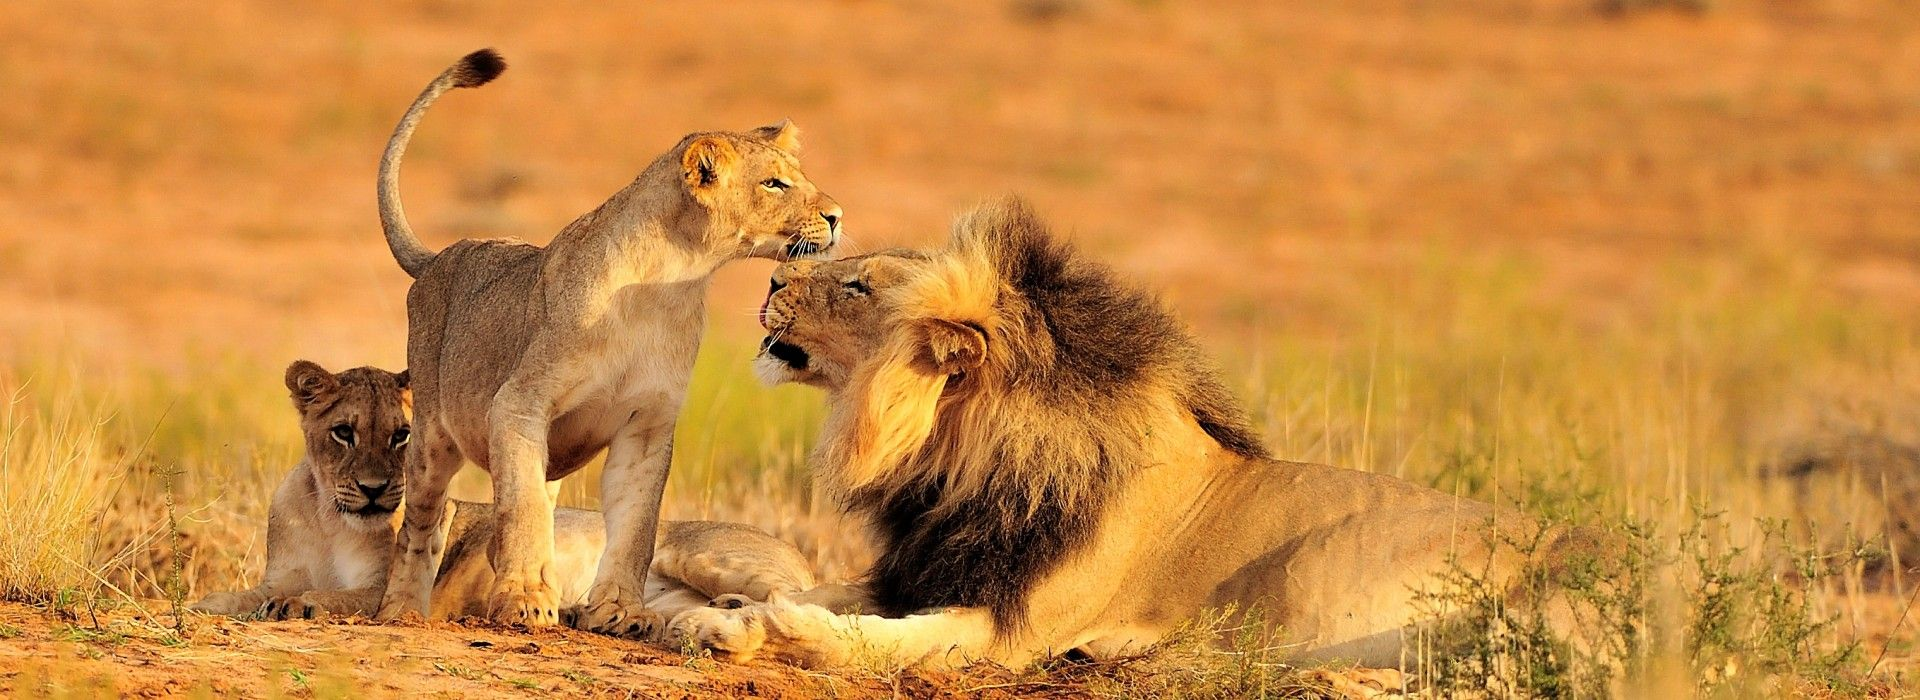 Wildlife Tours in Johannesburg